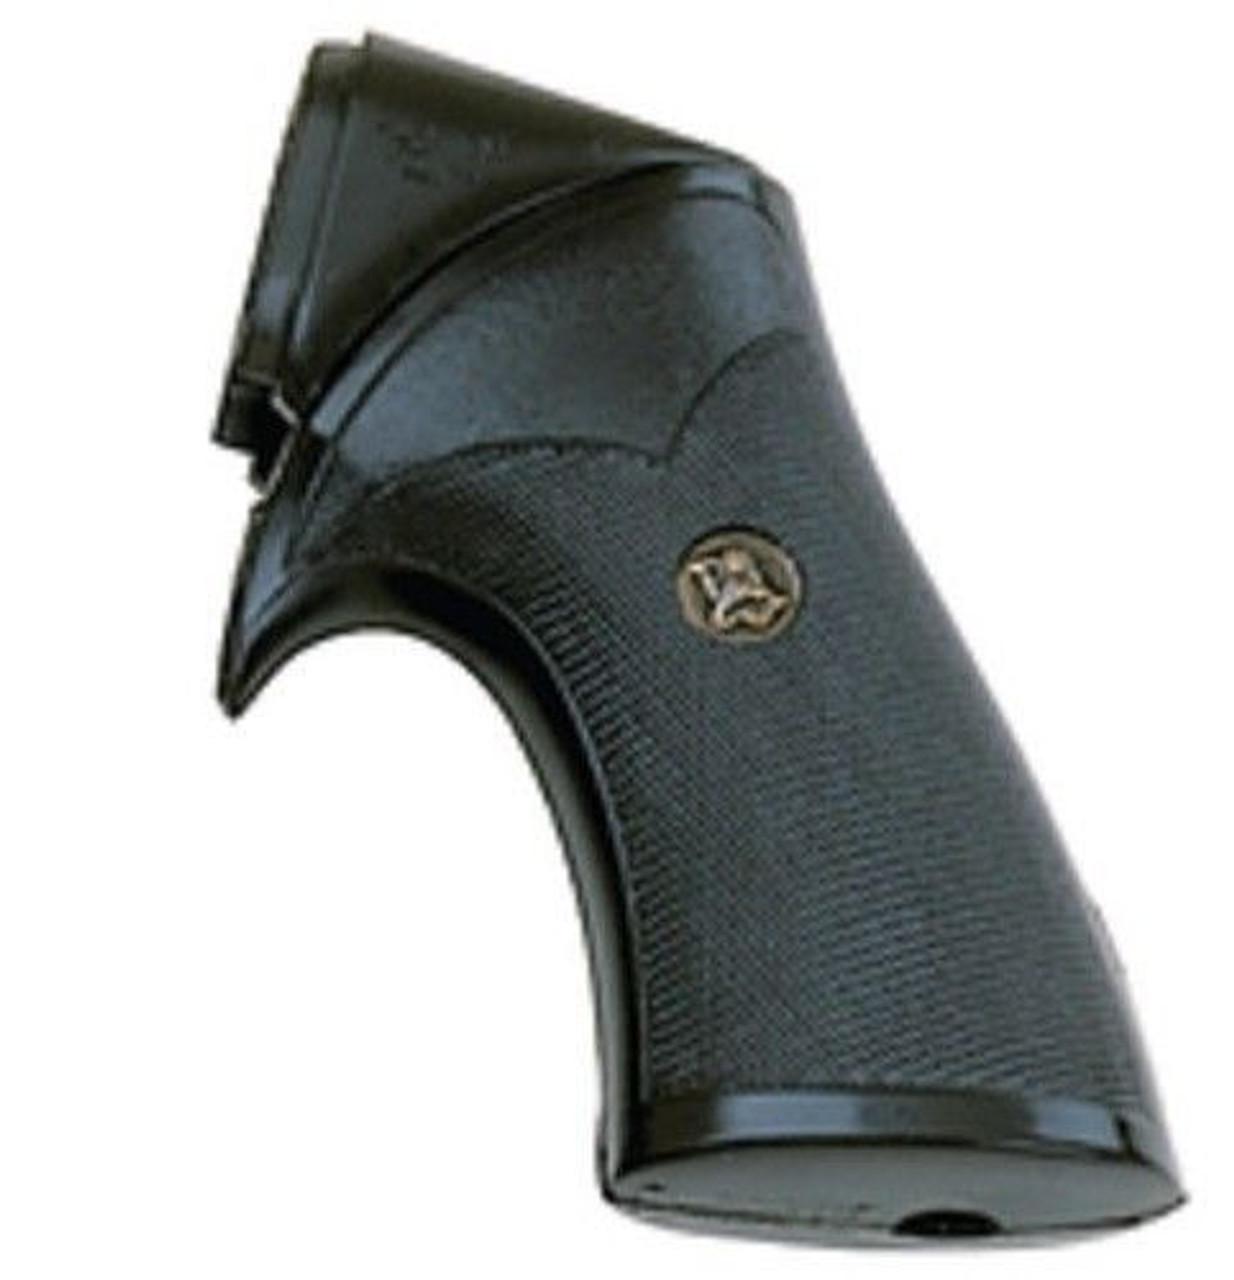 Pachmayr Vindicator Presentation Style Pistol Grip Remington 870 12 Gauge